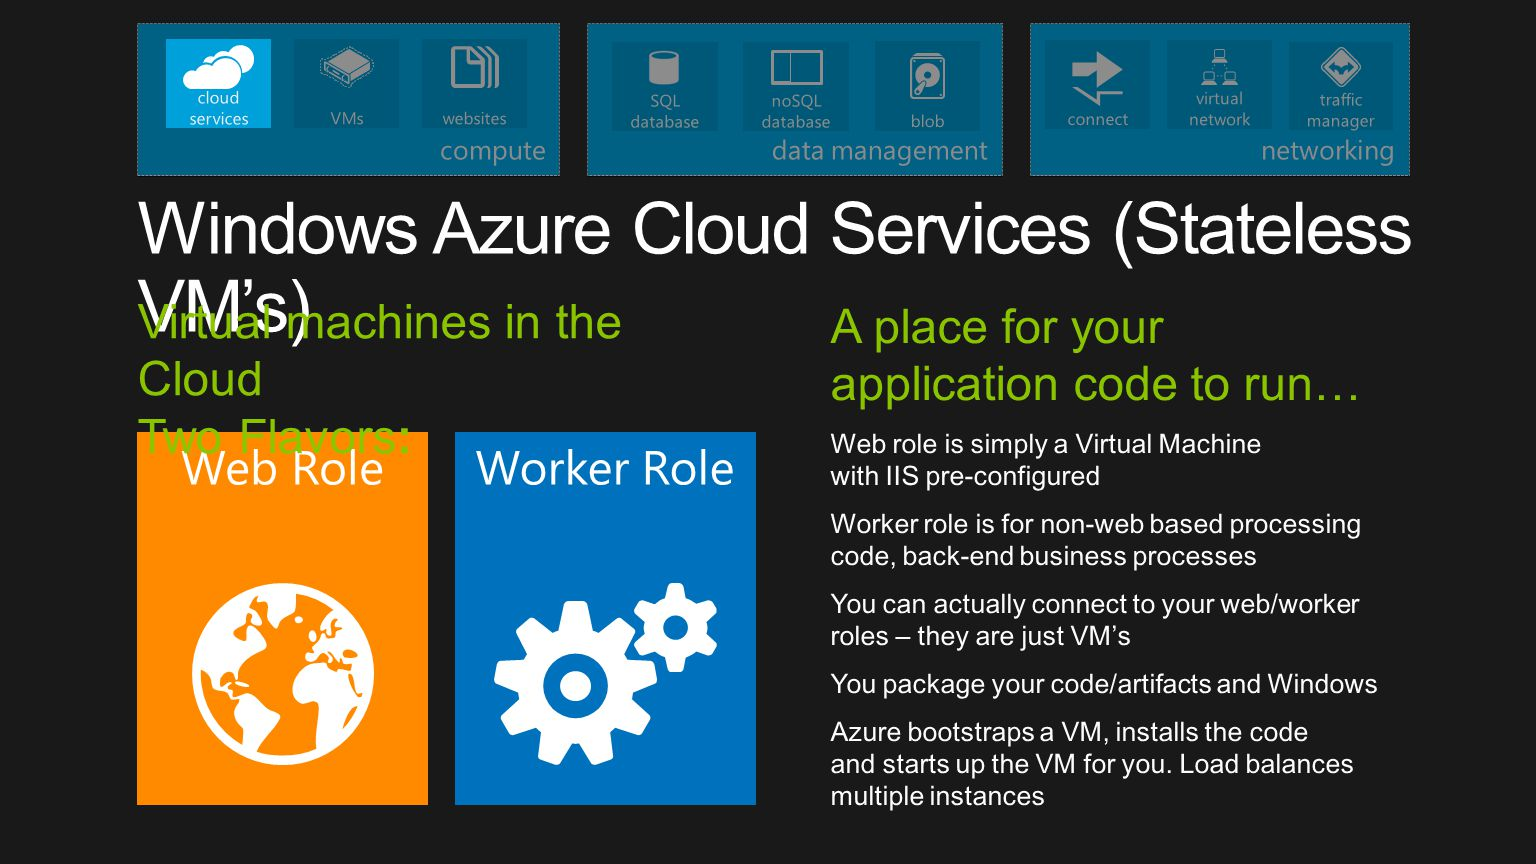 Windows Azure Cloud Services (Stateless VM's)